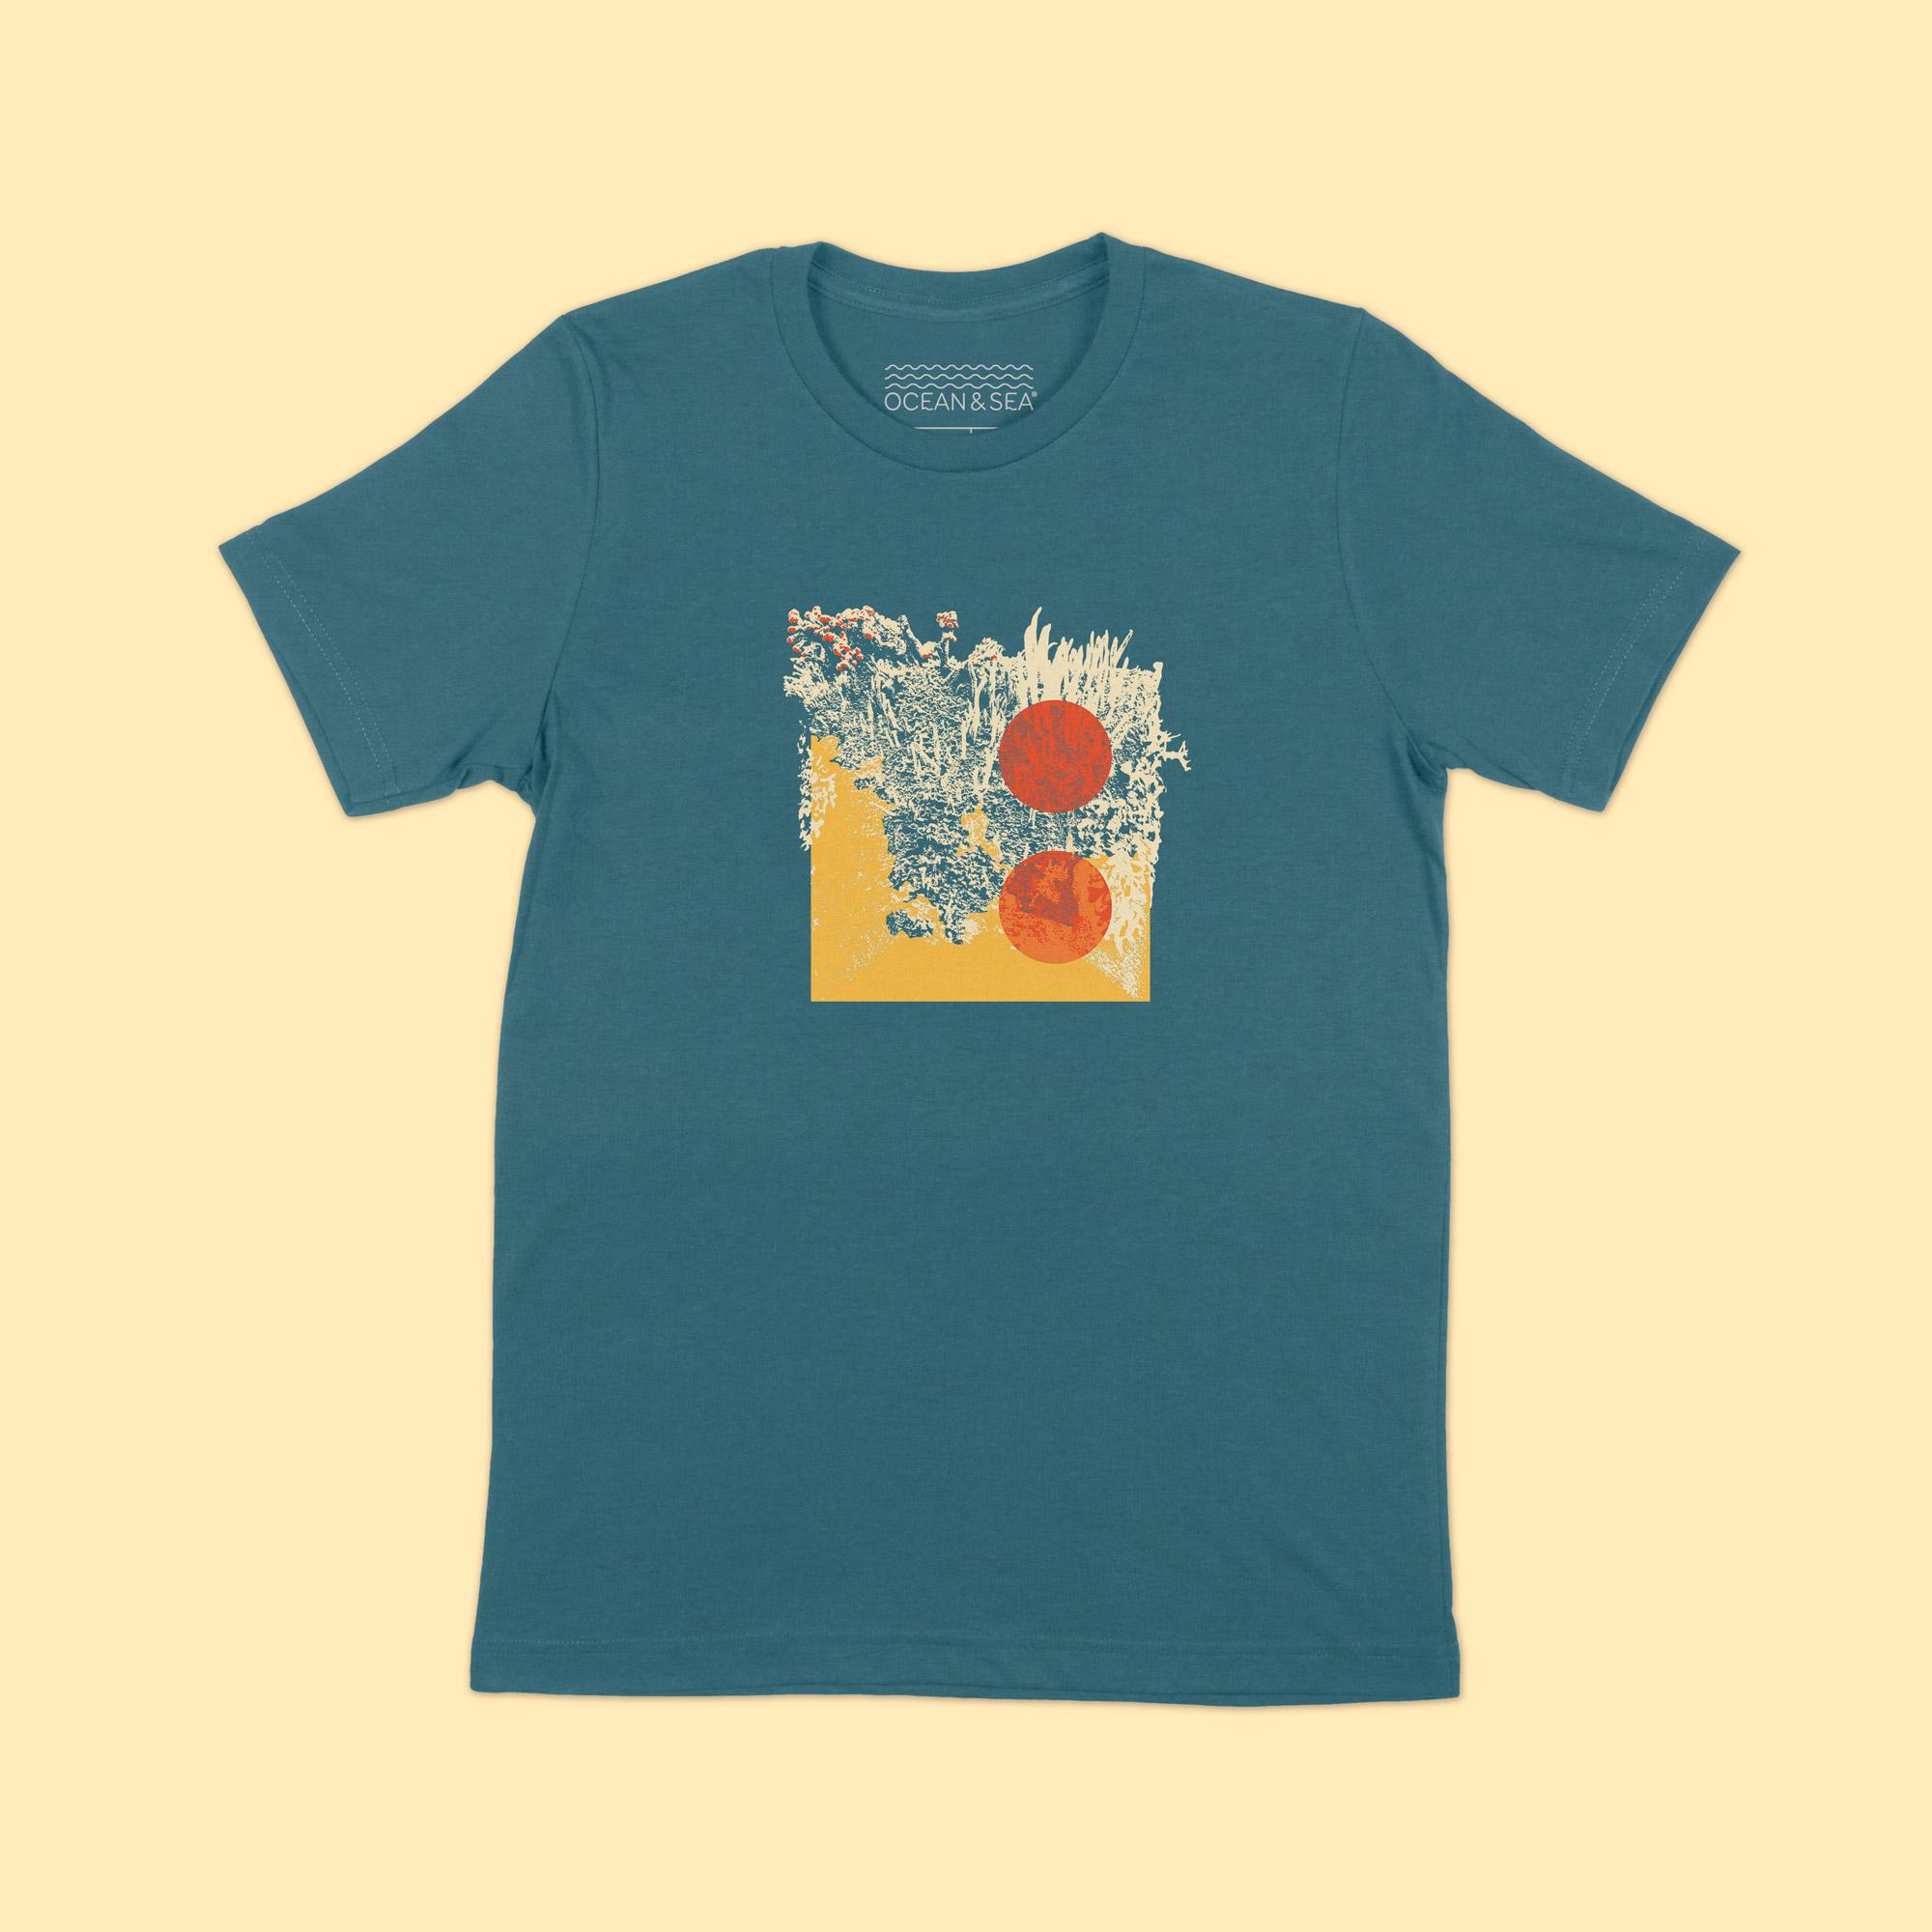 Ocean-and-Sea_T-Shirt_Alpha-B_Mockup